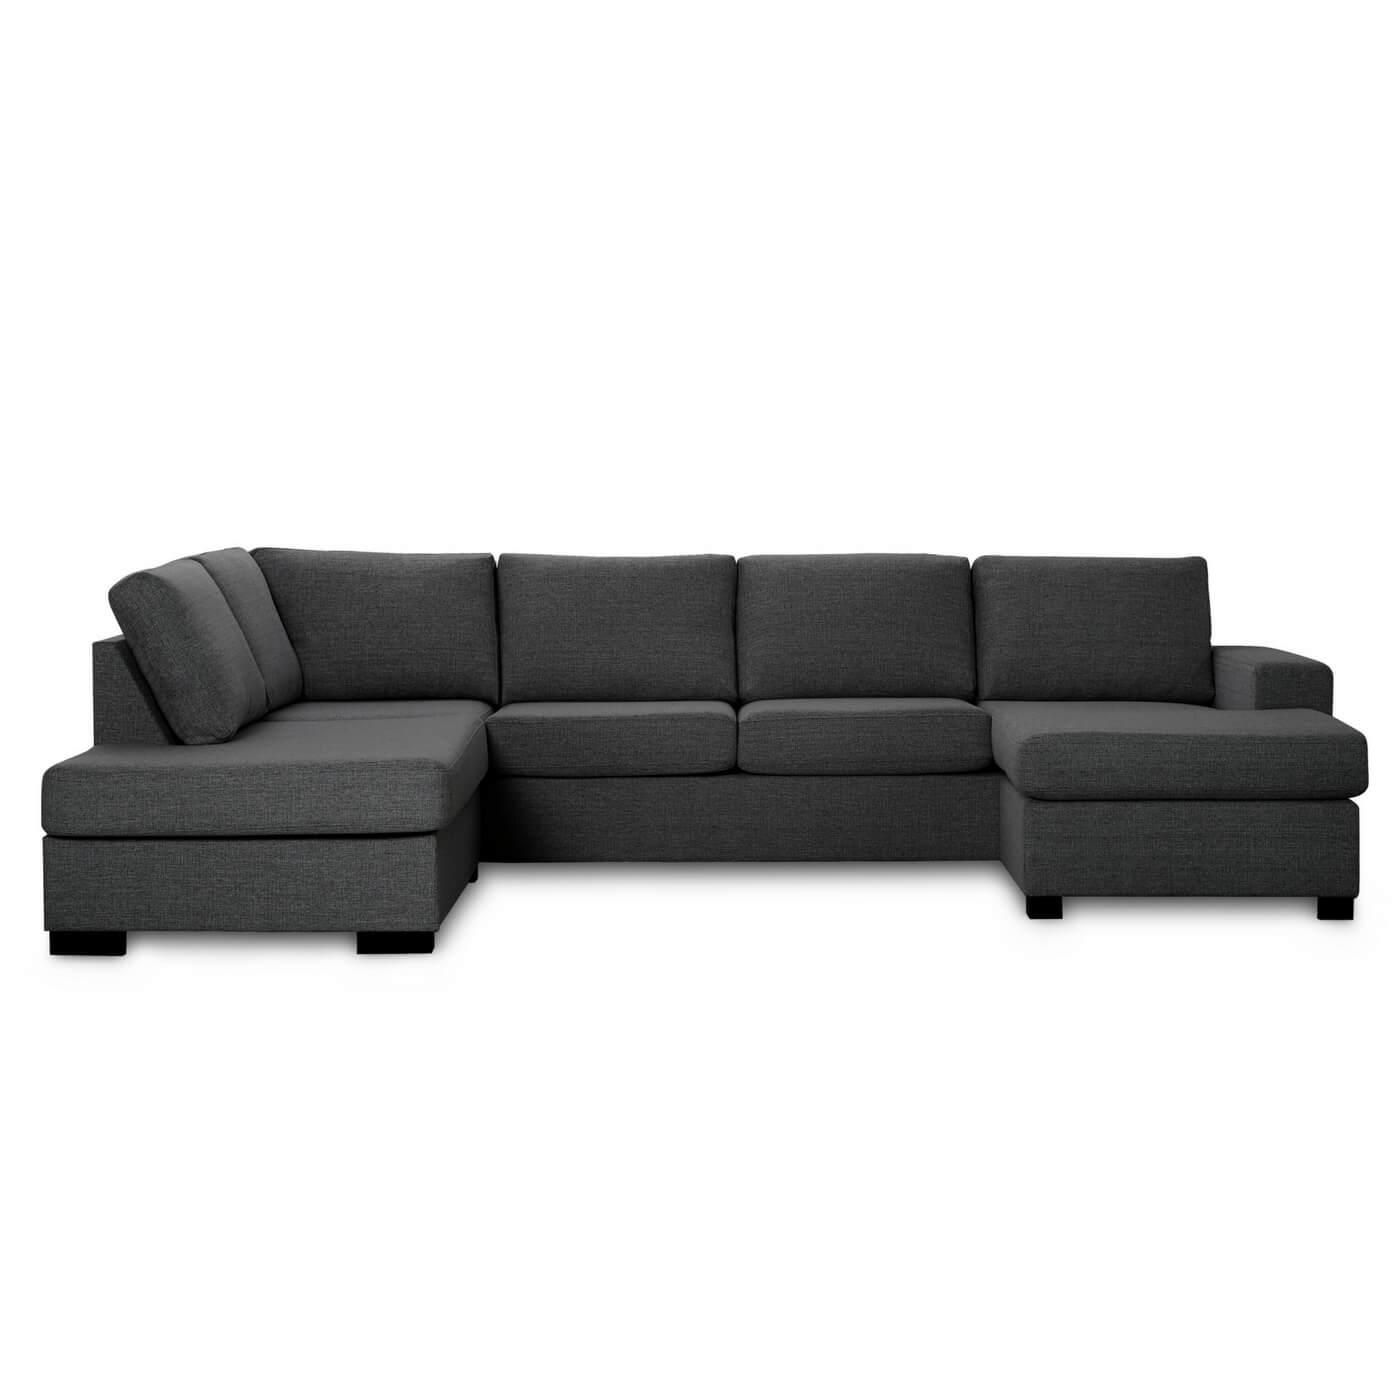 Milan venstrevendt U-sofa - antracitgrå stof